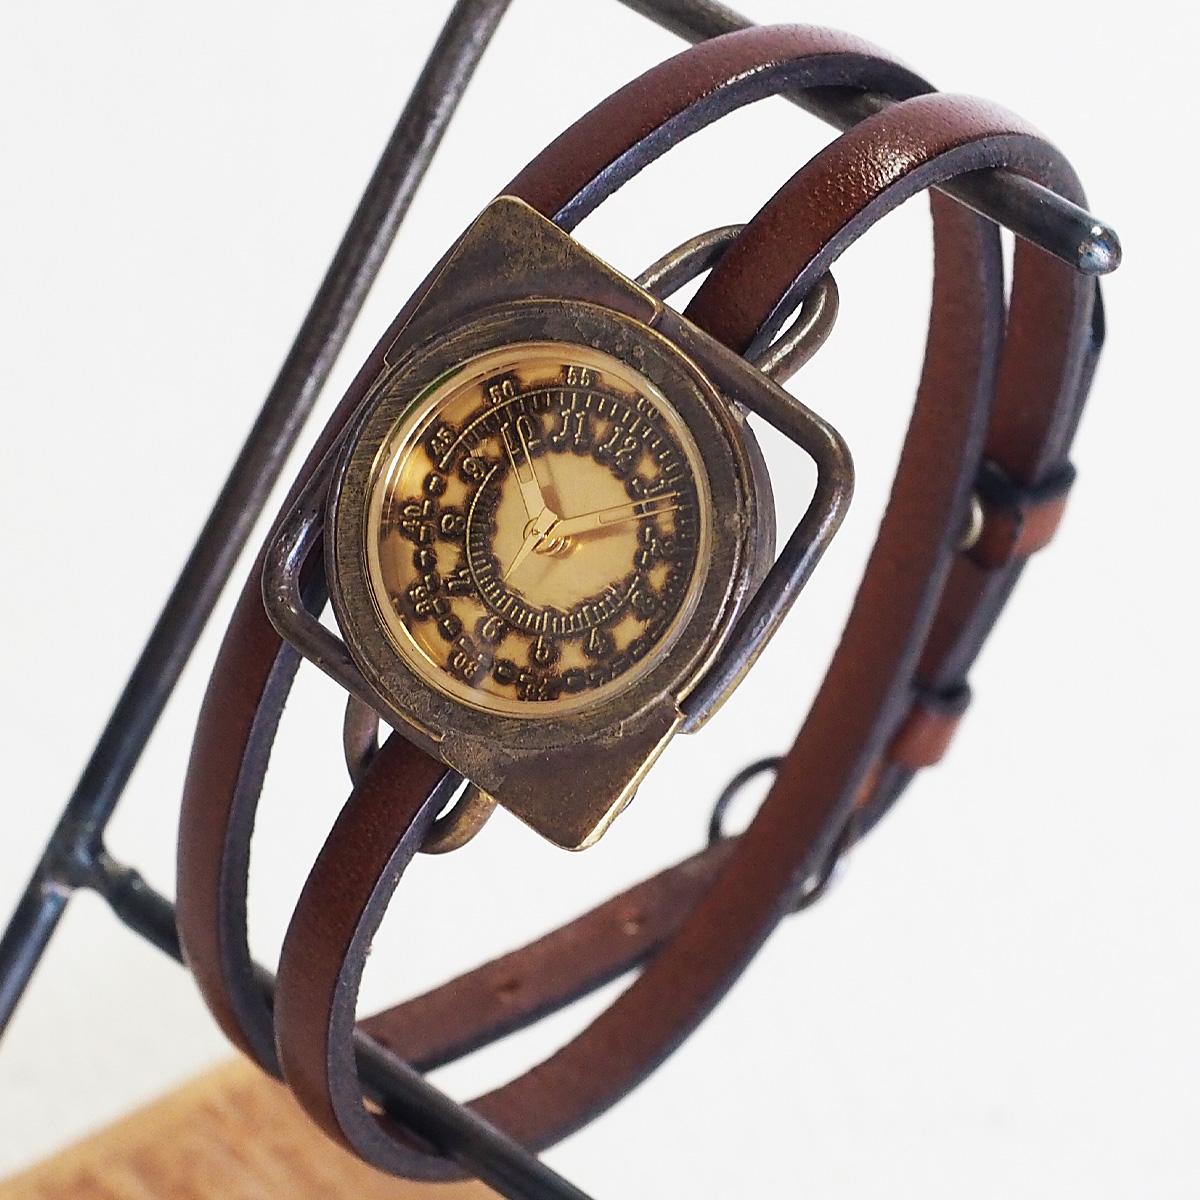 "vie(ヴィー) 手作り腕時計 ""square antique -スクエア アンティーク-"" 2重ベルト レディース [WB-031-W-BELT]"